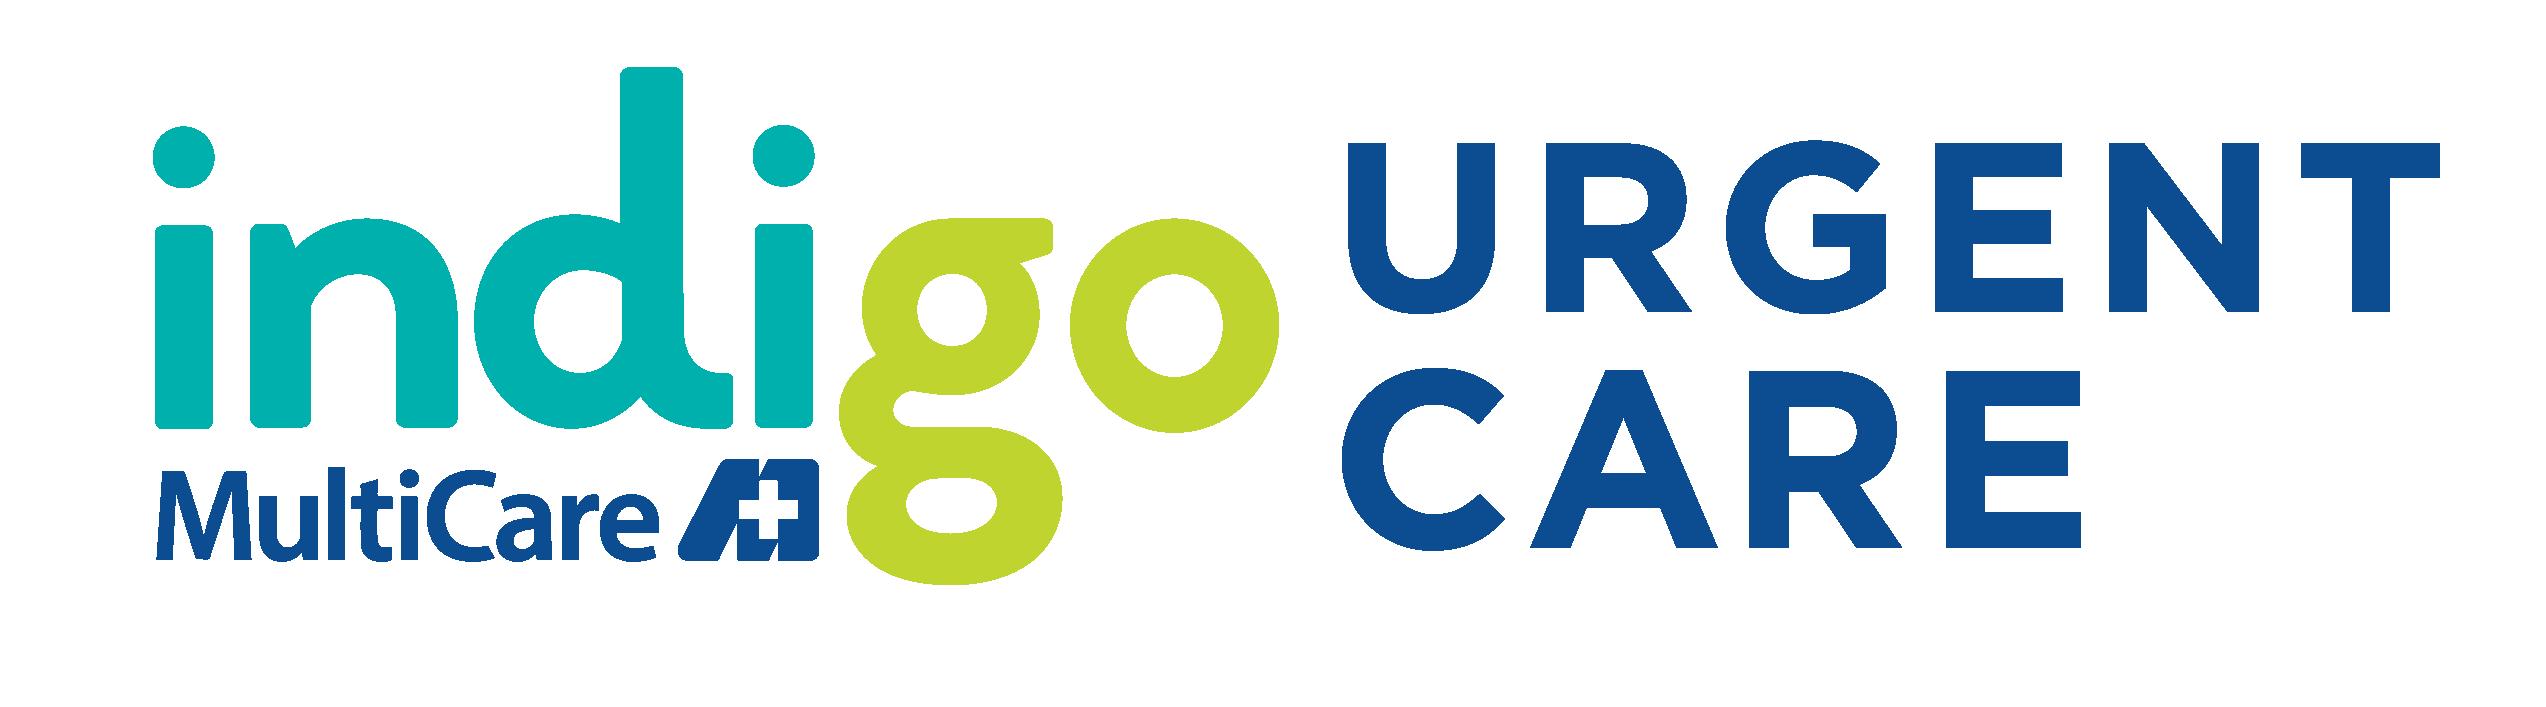 MultiCare Indigo Urgent Care - Tukwila Logo